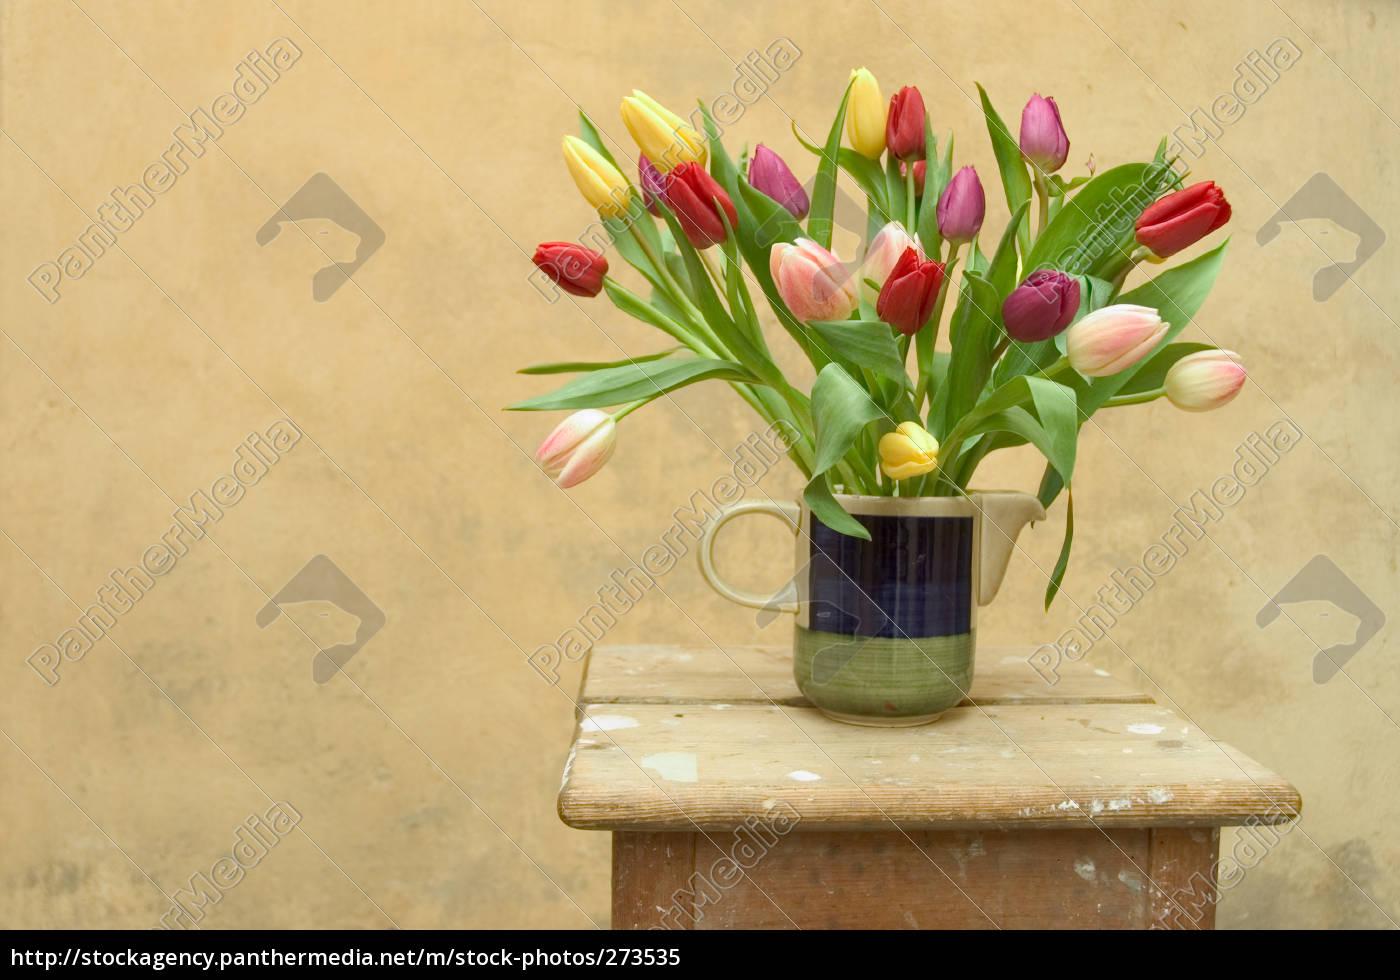 tulips - 273535